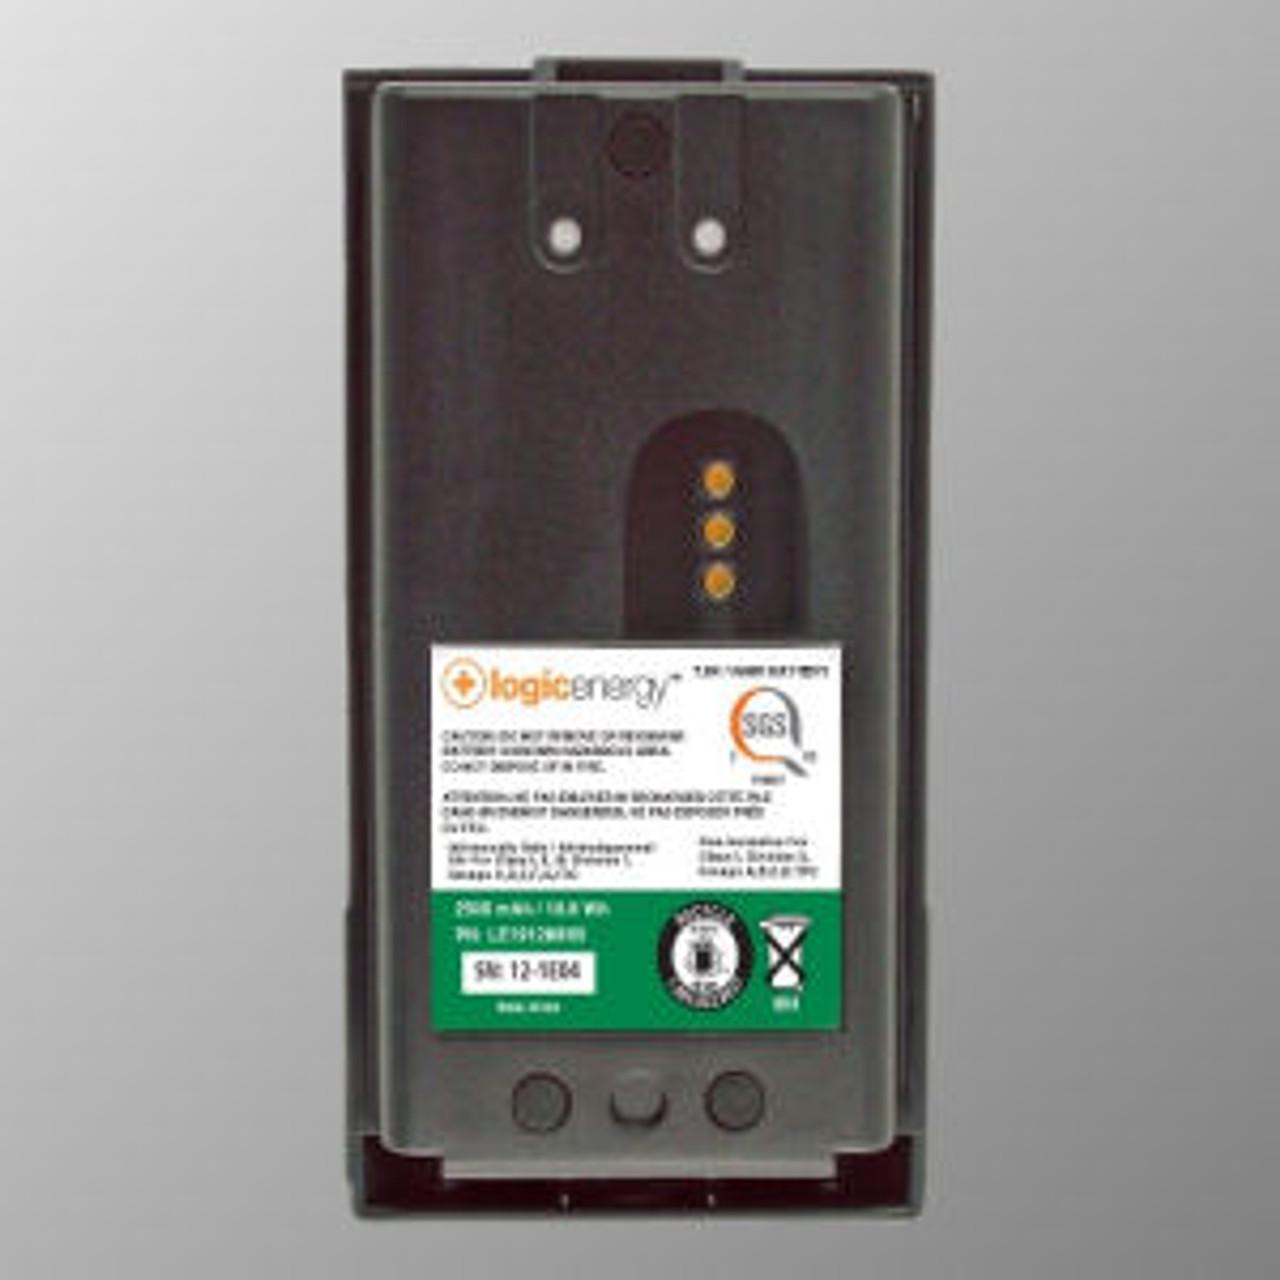 M/A-Com P5250 Intrinsically Safe Battery - 2500mAh Ni-MH